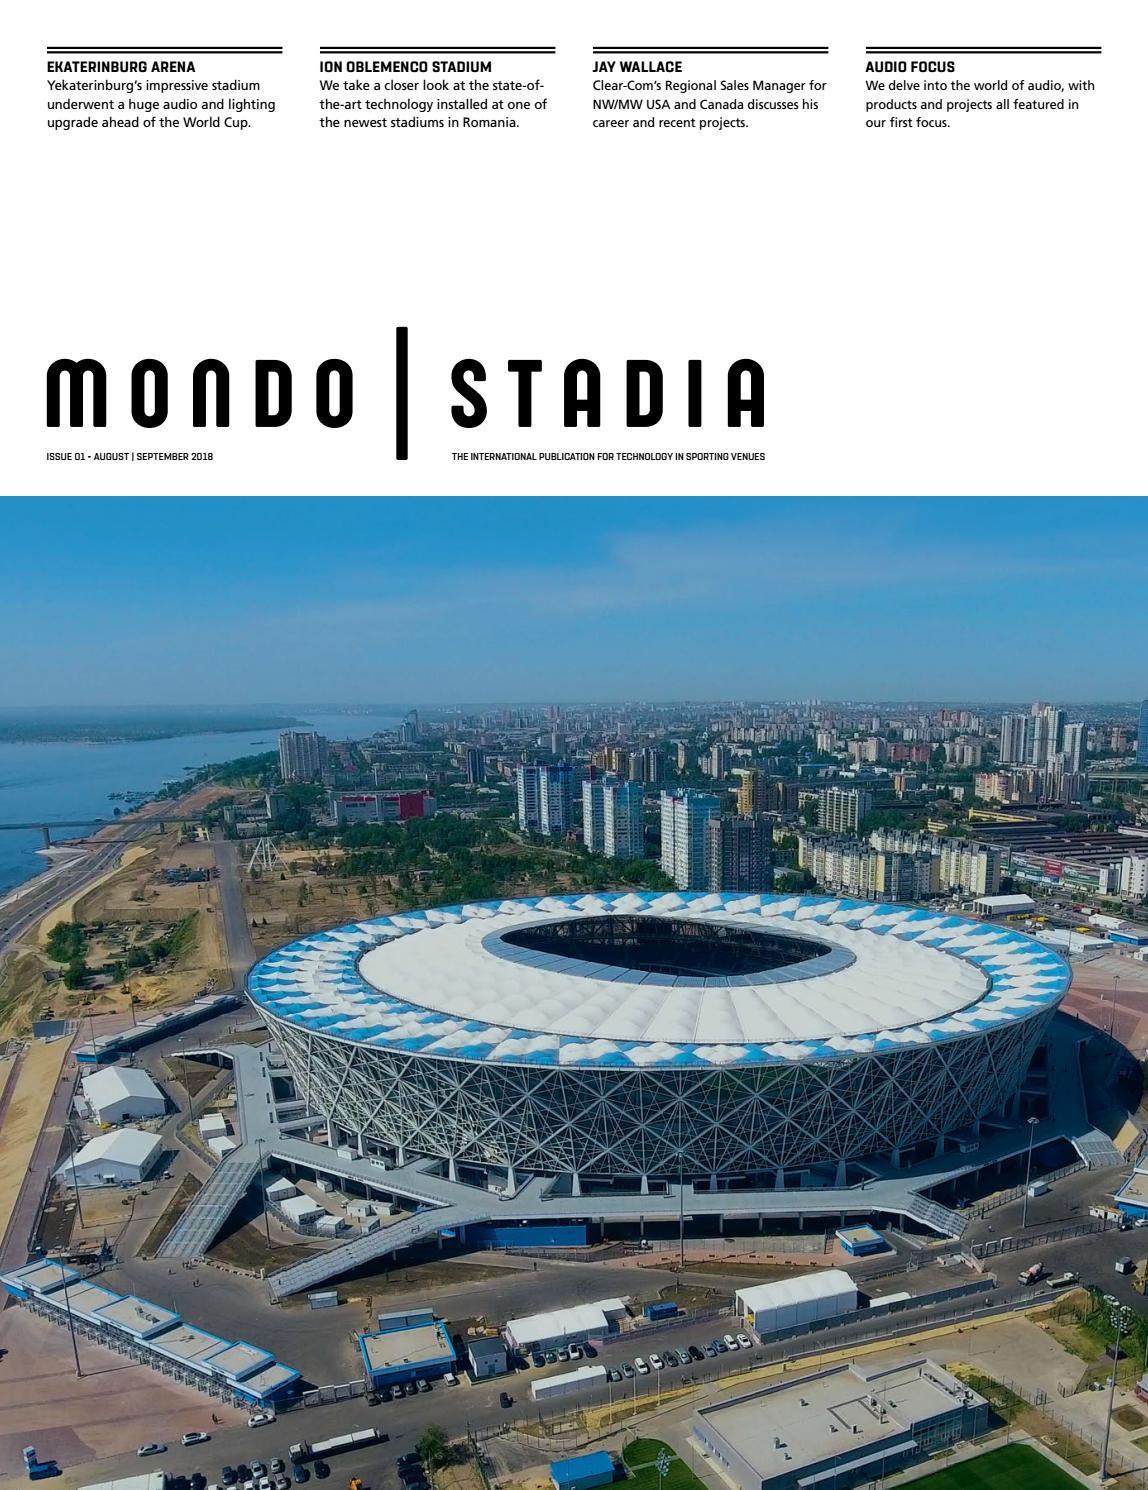 mondo   stadia - Issue 01 by Mondiale Publishing - issuu 76e1fb0a580